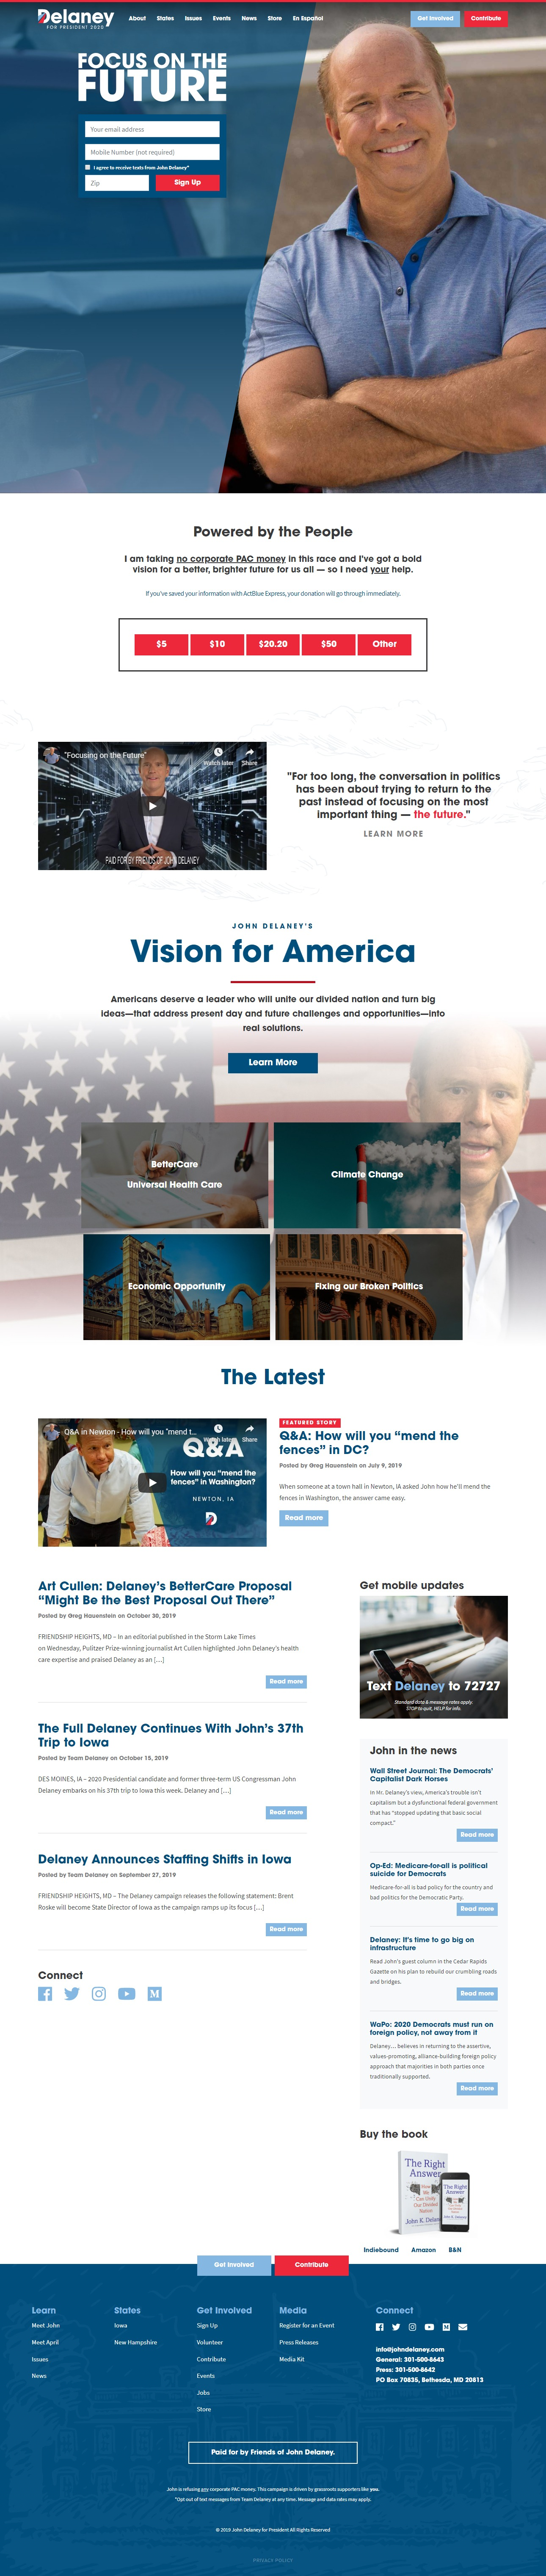 Homepage Snapshot for November 1, 2019: Former Representative John Delaney